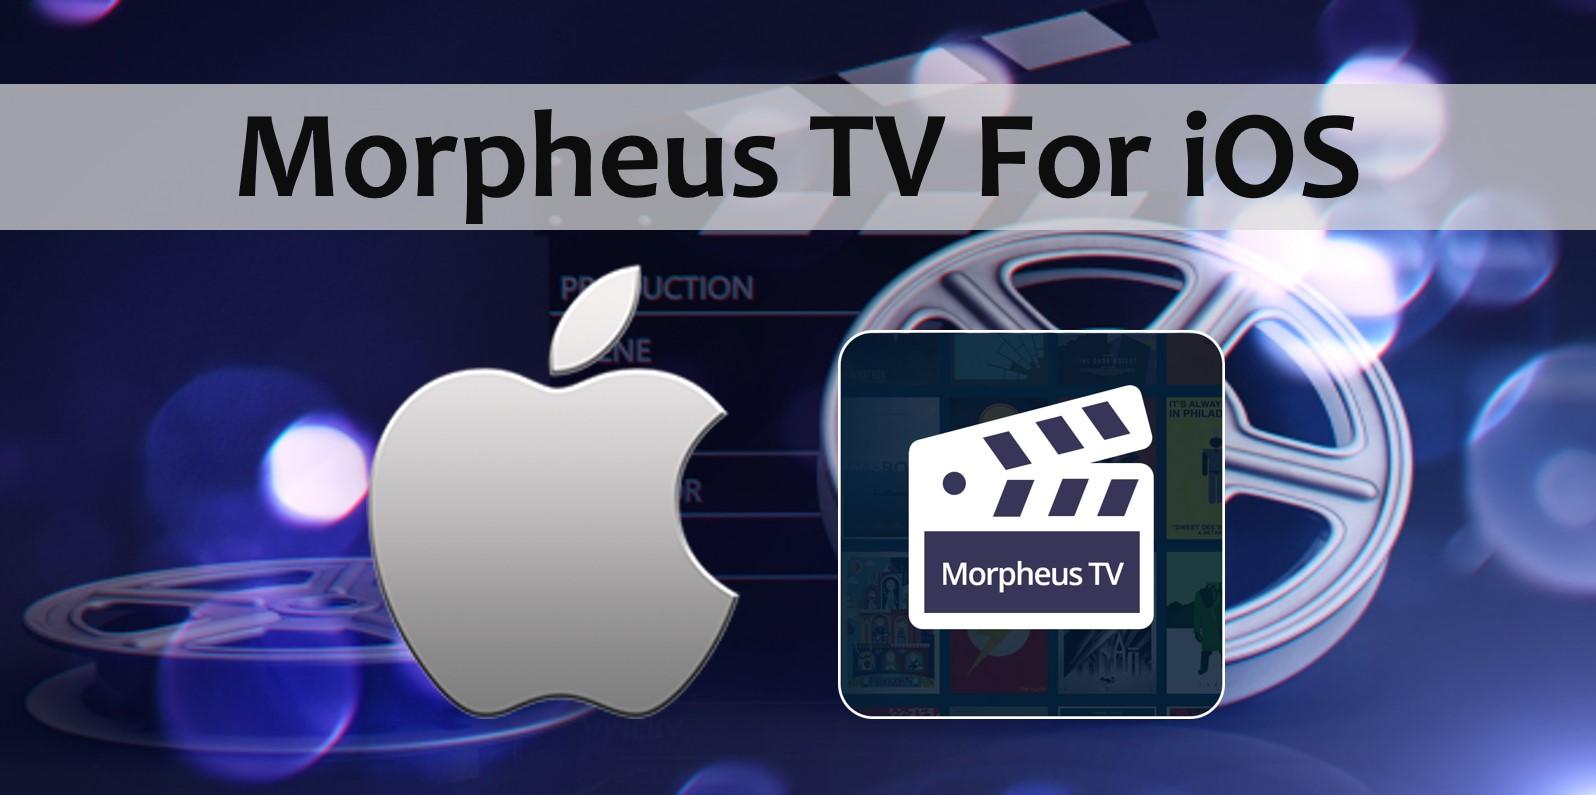 morpheus tv for ios